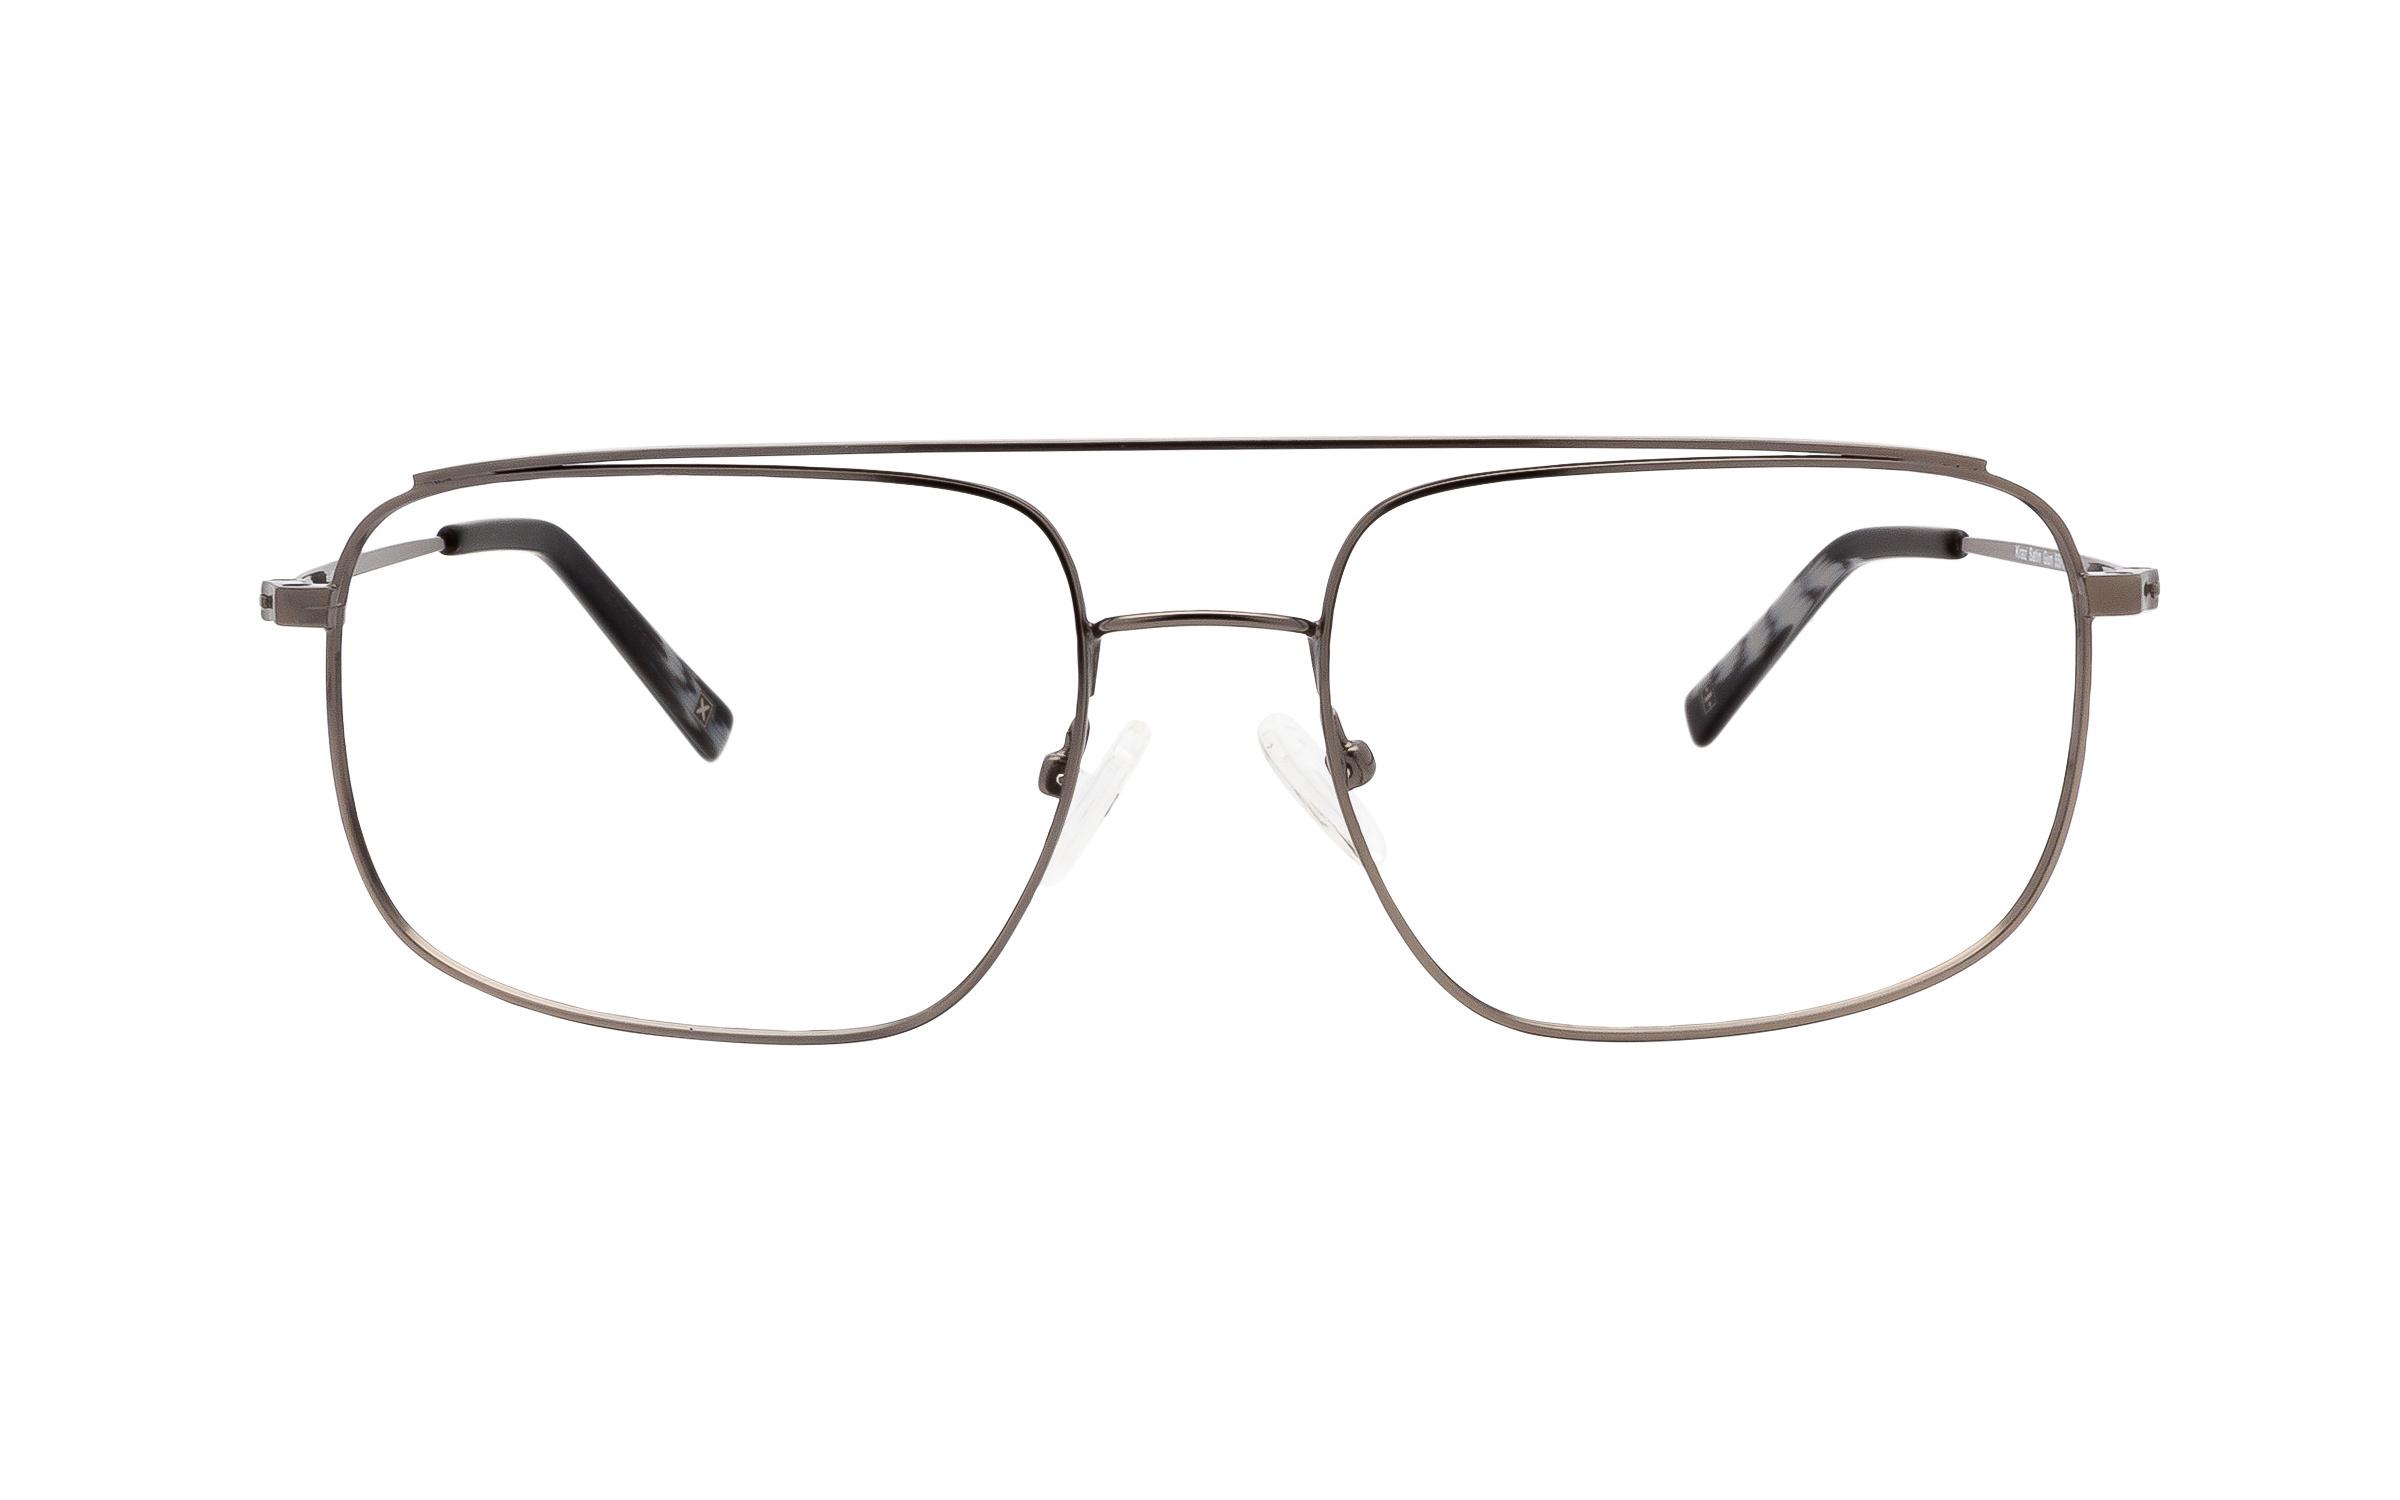 http://www.coastal.com/ - Derek Cardigan Kraz DC221 C03 (55) Eyeglasses and Frame in Satin Gun Grey | Metal – Online Coastal